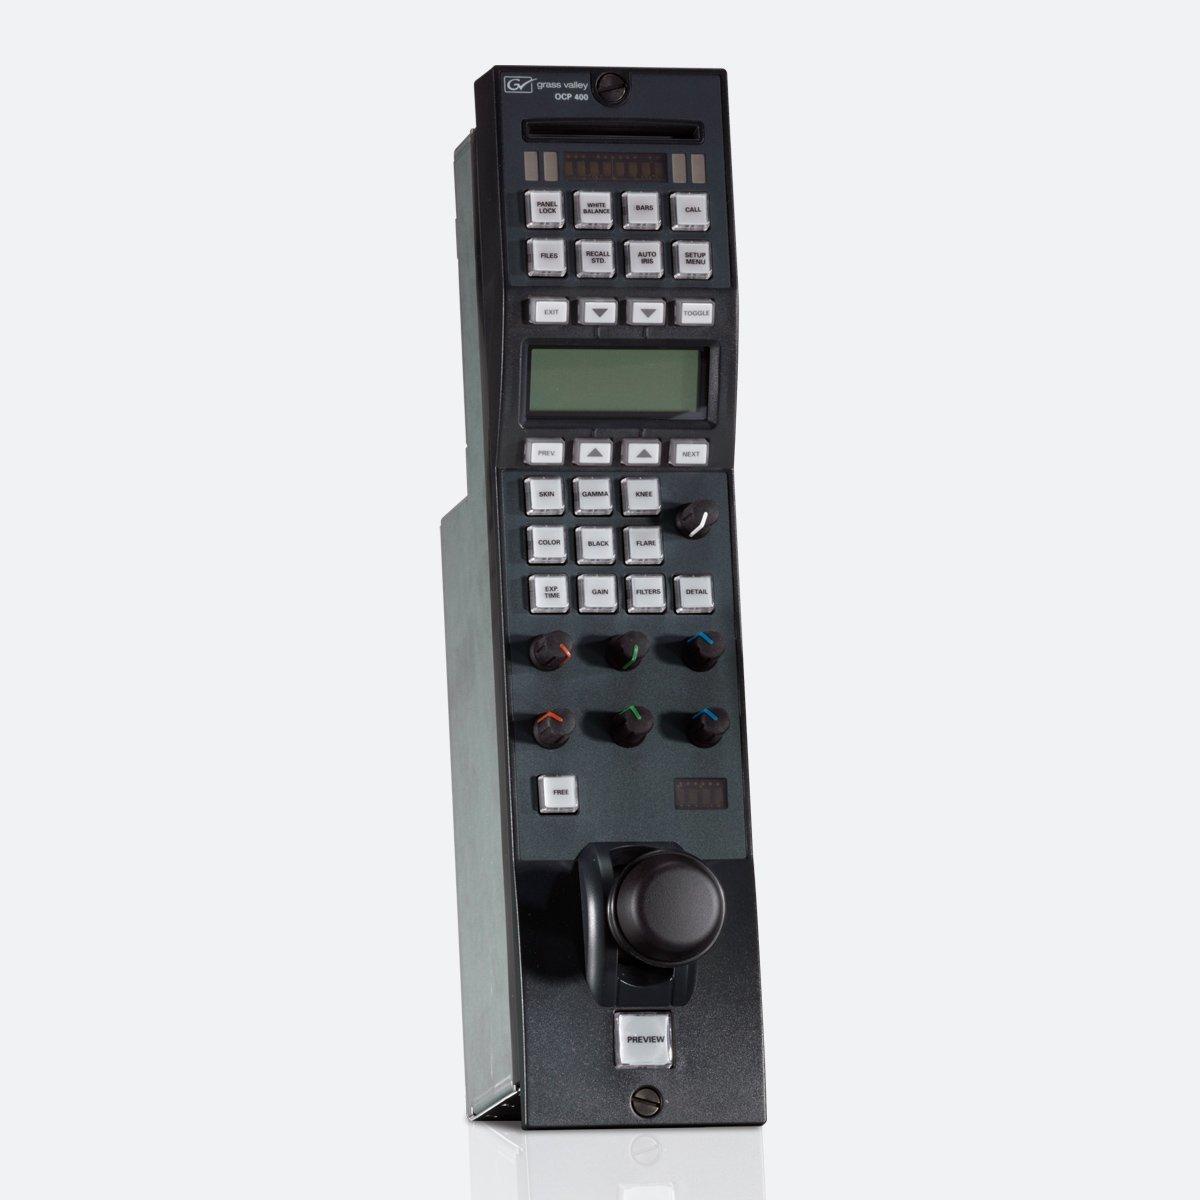 Grass Valley OCP-400 LDX/LDK Operational Control Panel